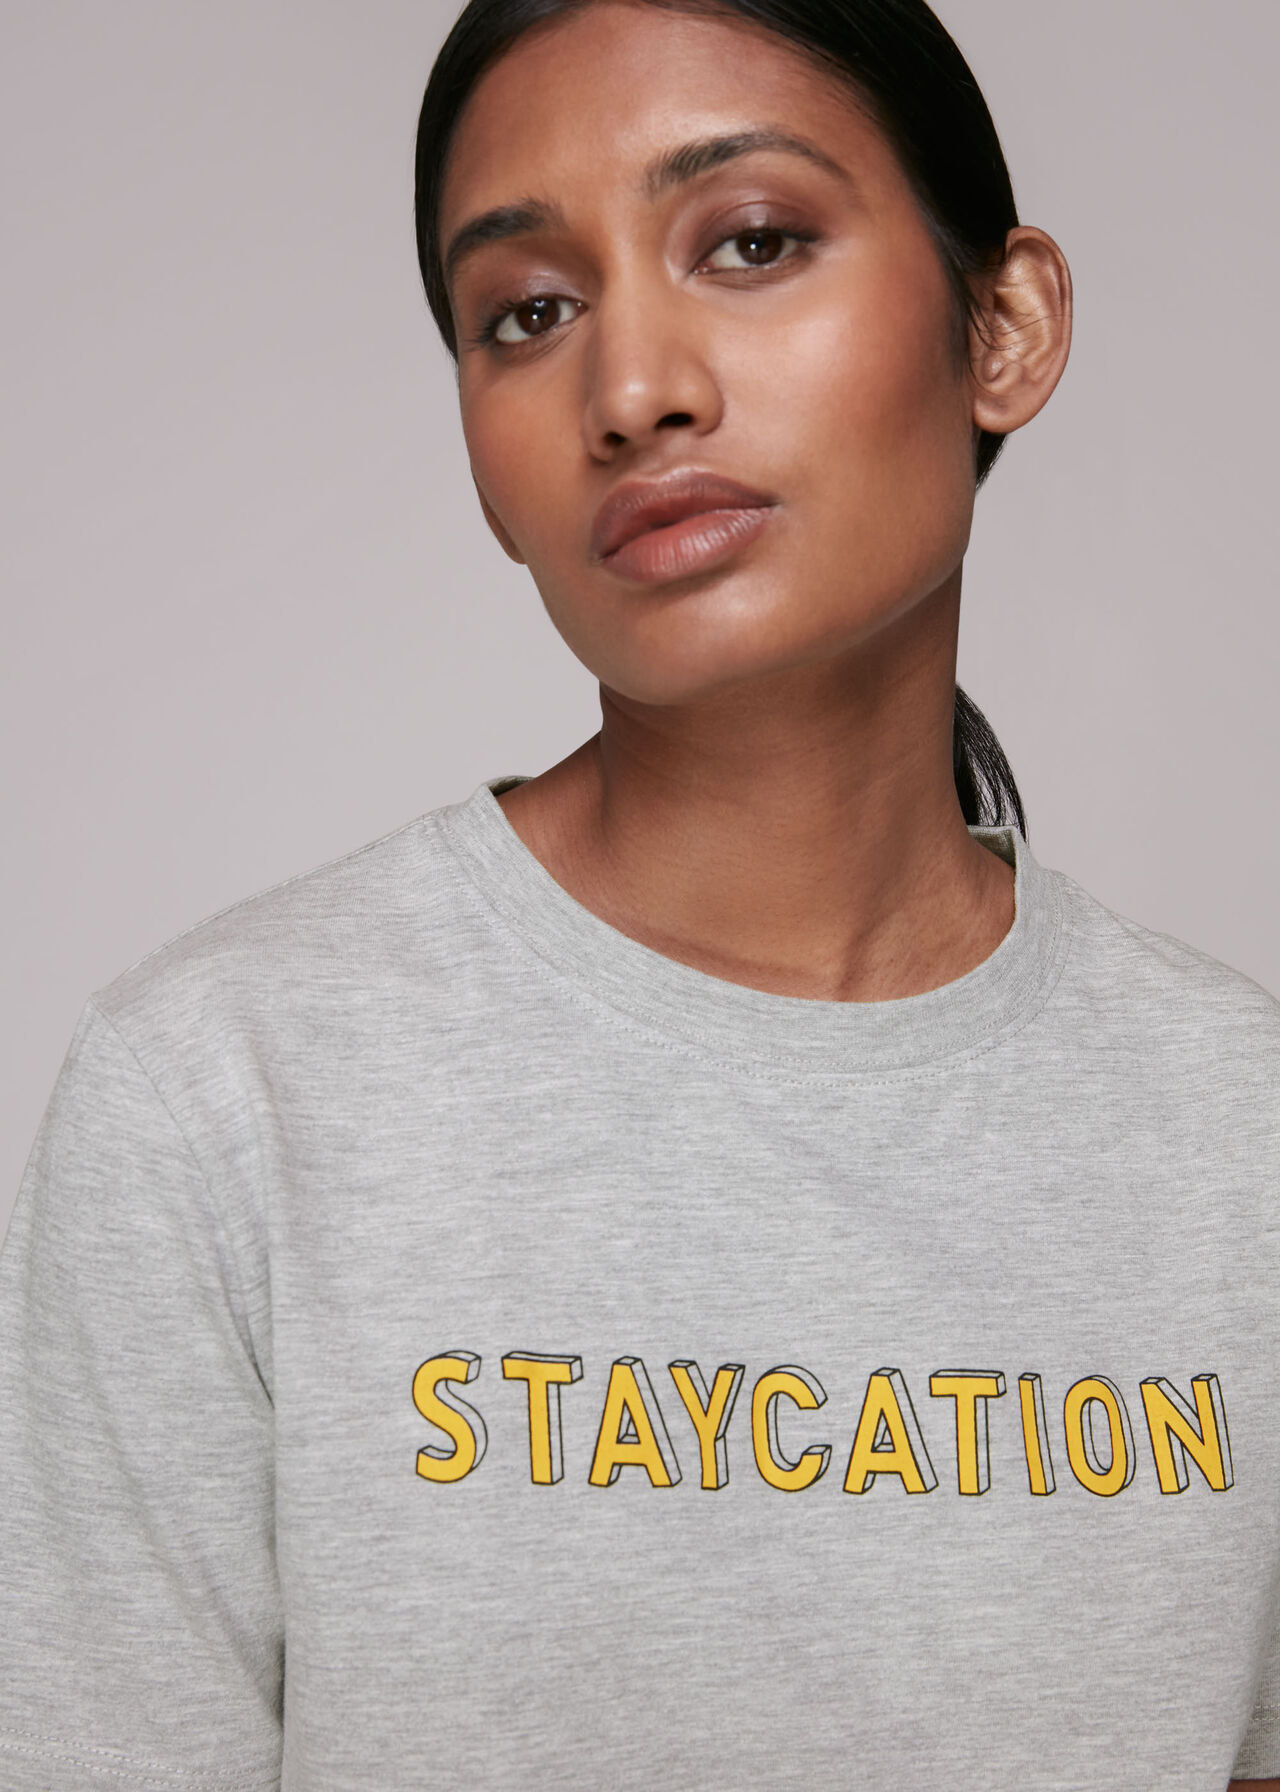 Staycation Logo Tee